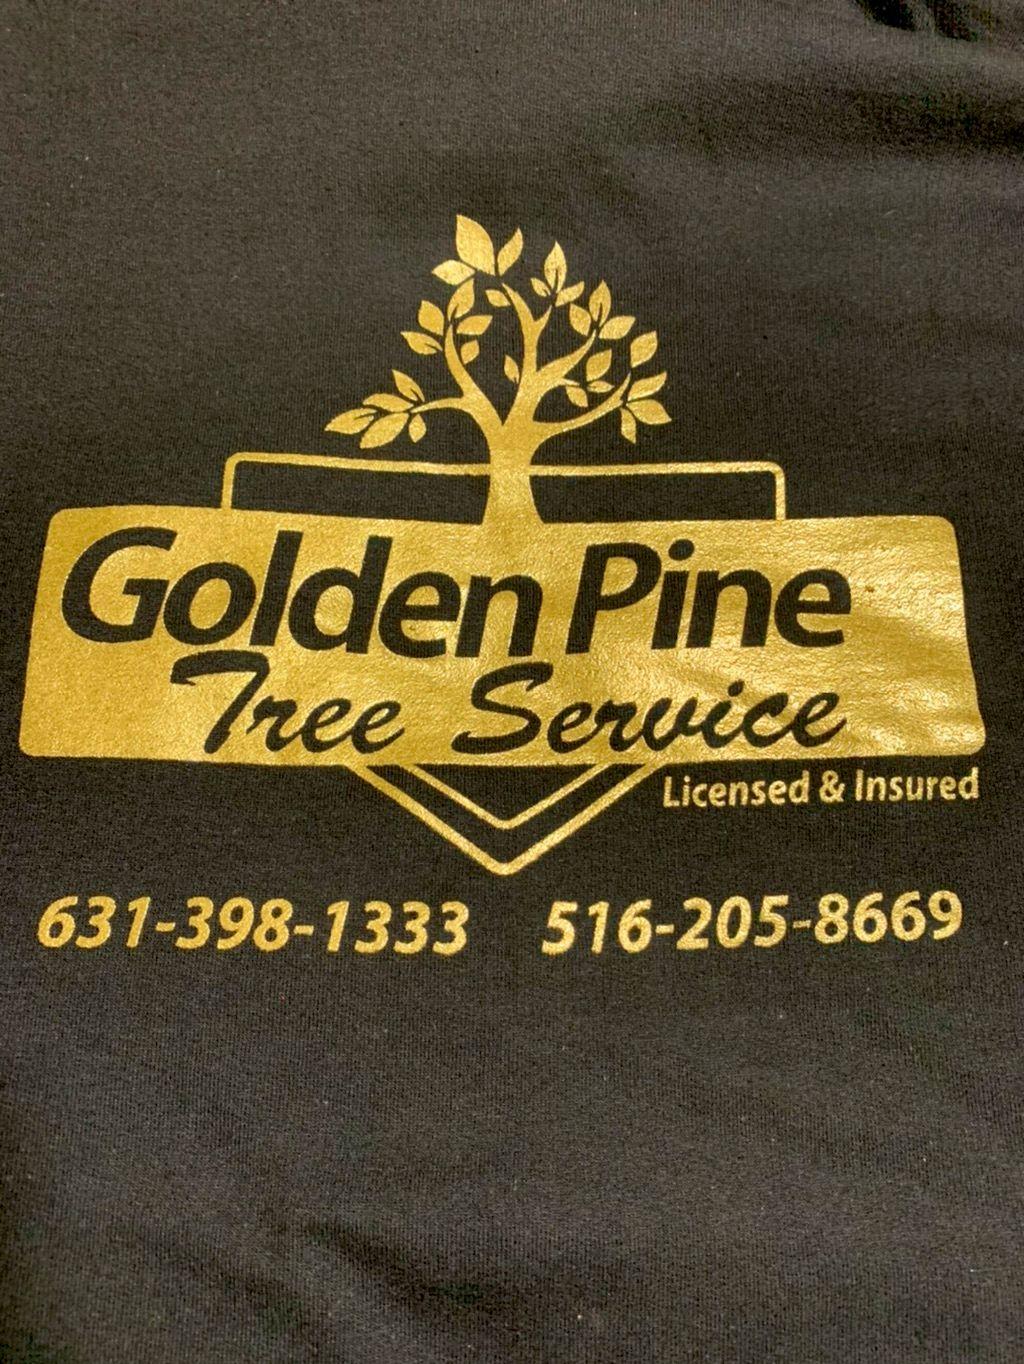 Golden pine tree service